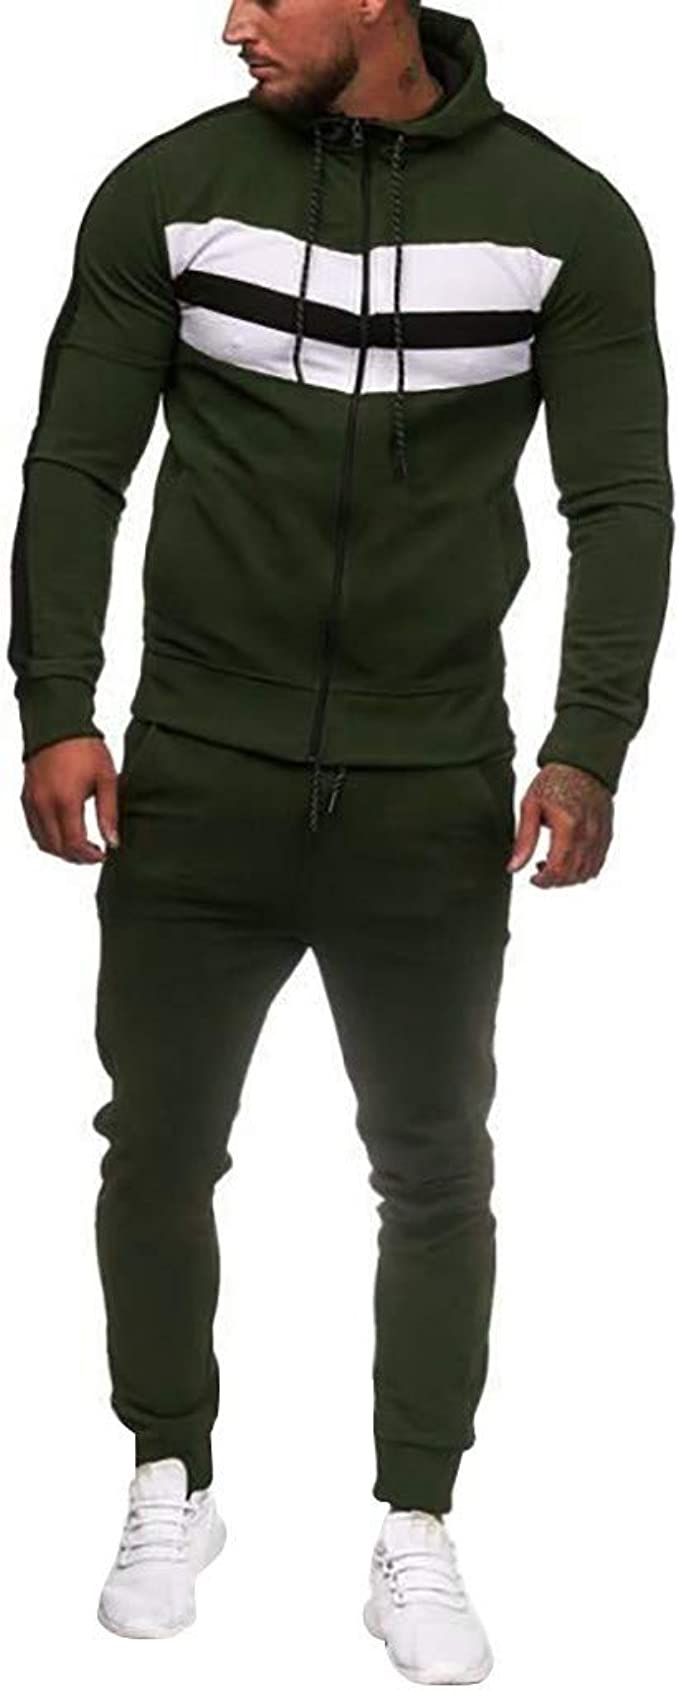 Herren Uni Colour Jogging Anzug Trainingsanzug Sportanzug Fitness Hose Hoodie H